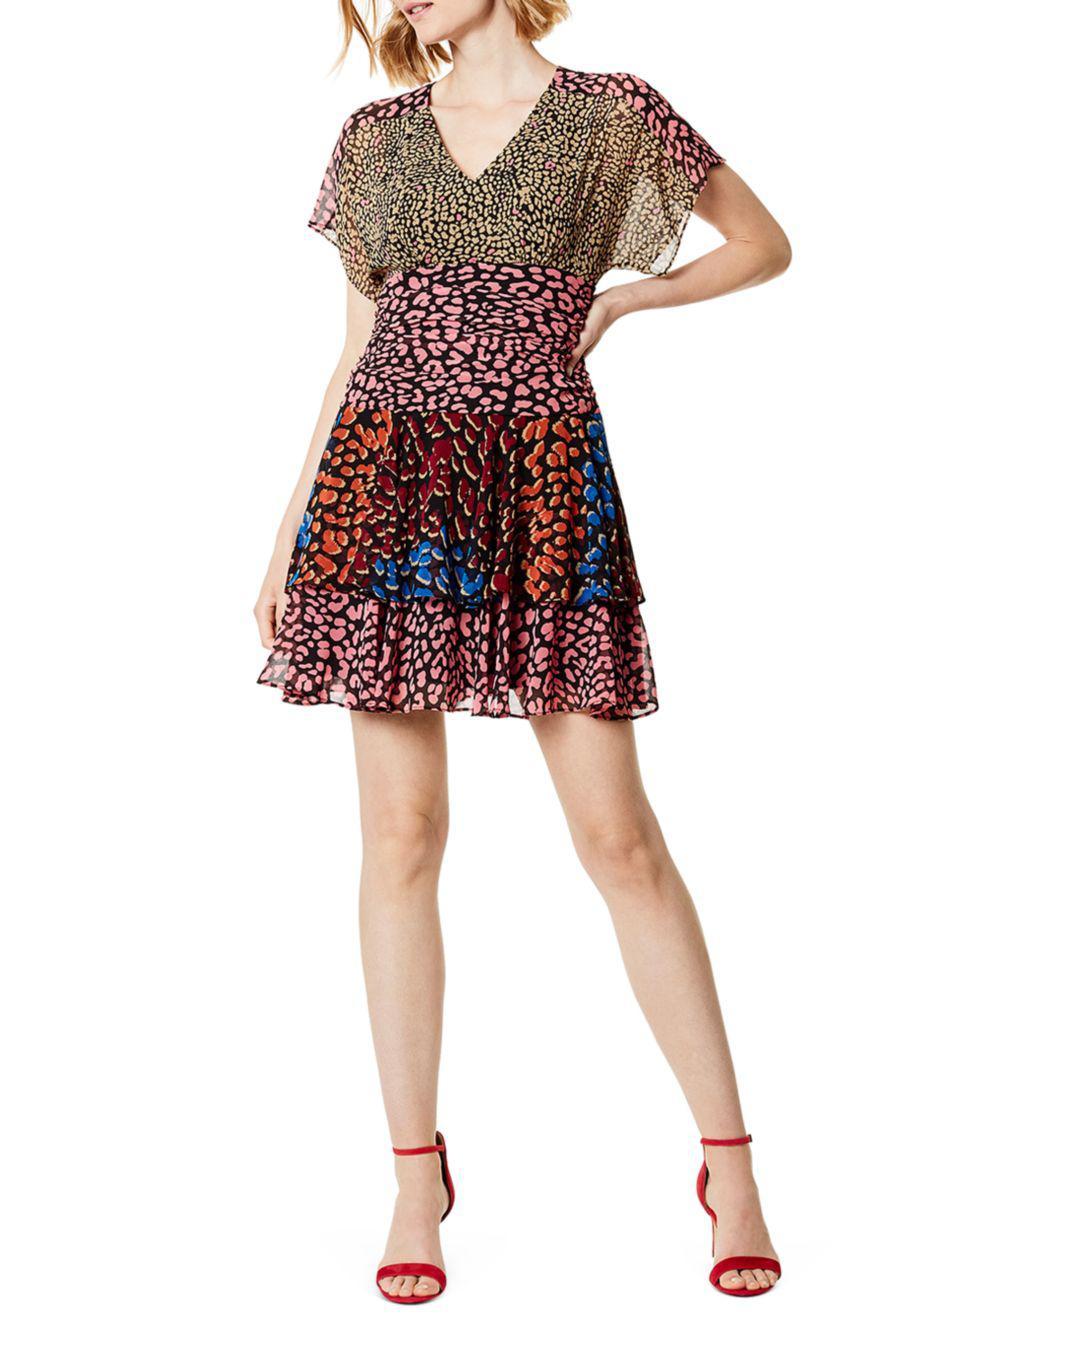 Lyst - Karen Millen Mixed Leopard-print Mini Dress in Red 4dd1ac056